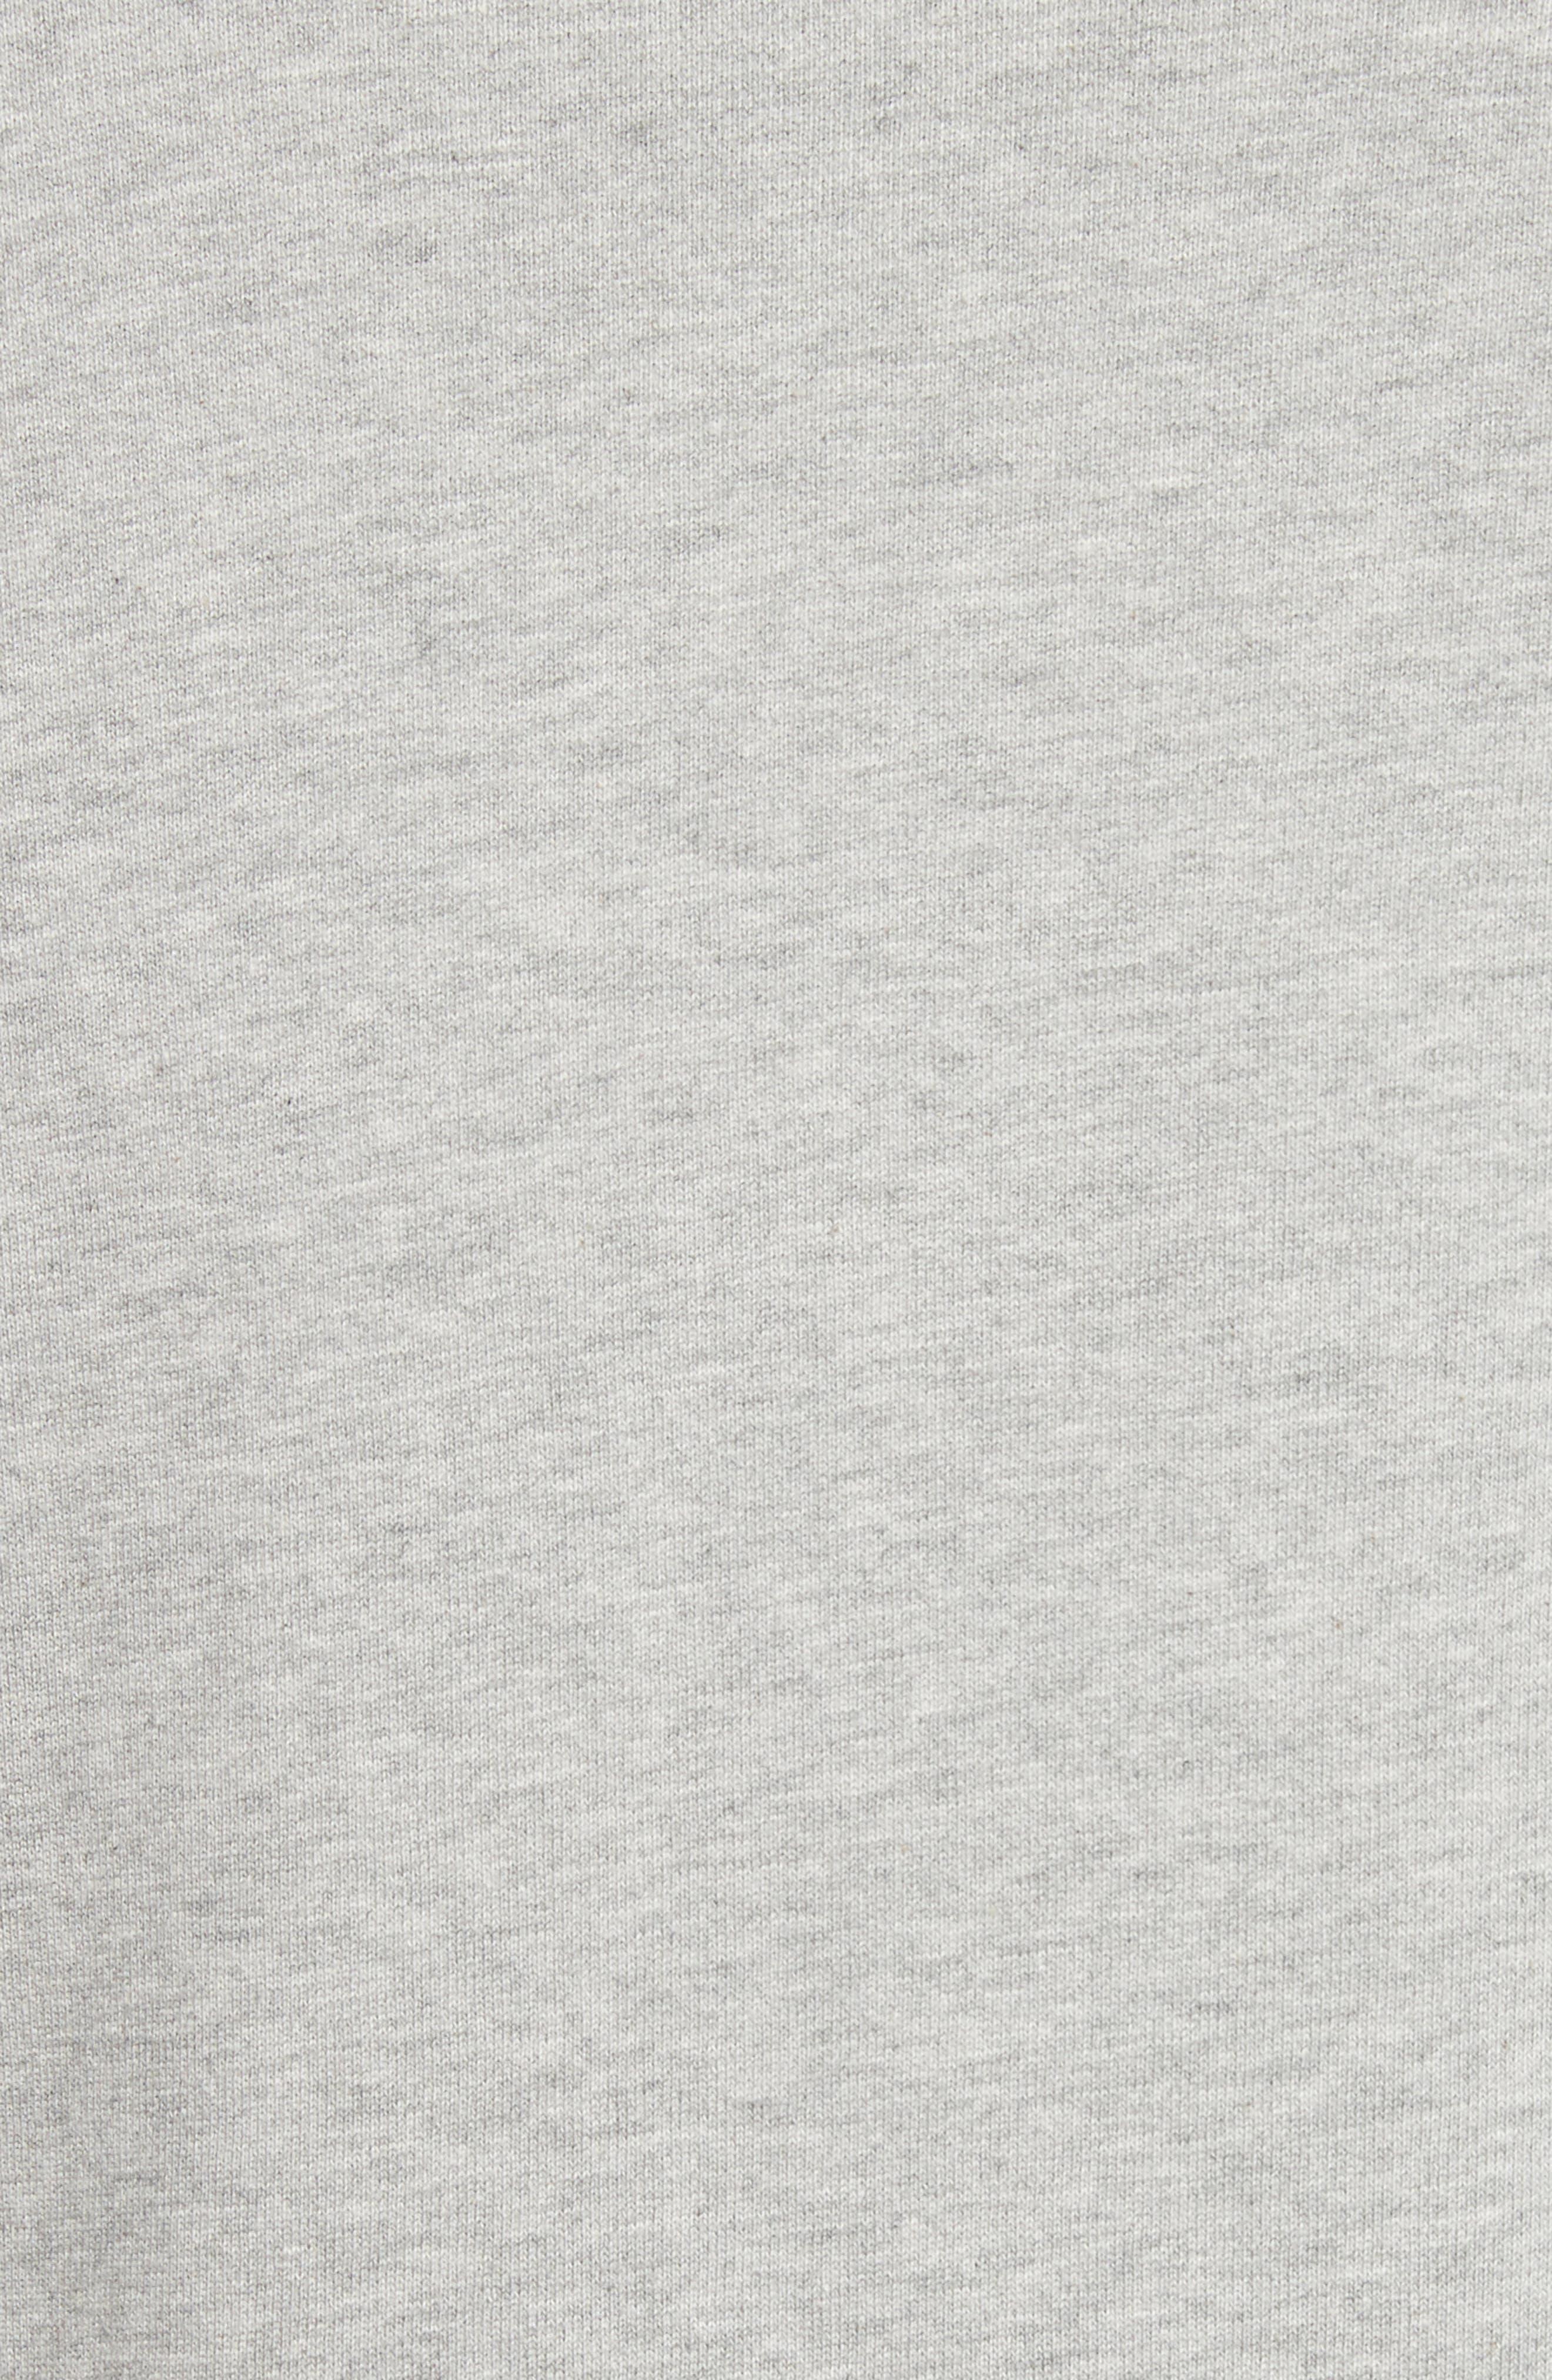 Crewneck Sweatshirt,                             Alternate thumbnail 5, color,                             060